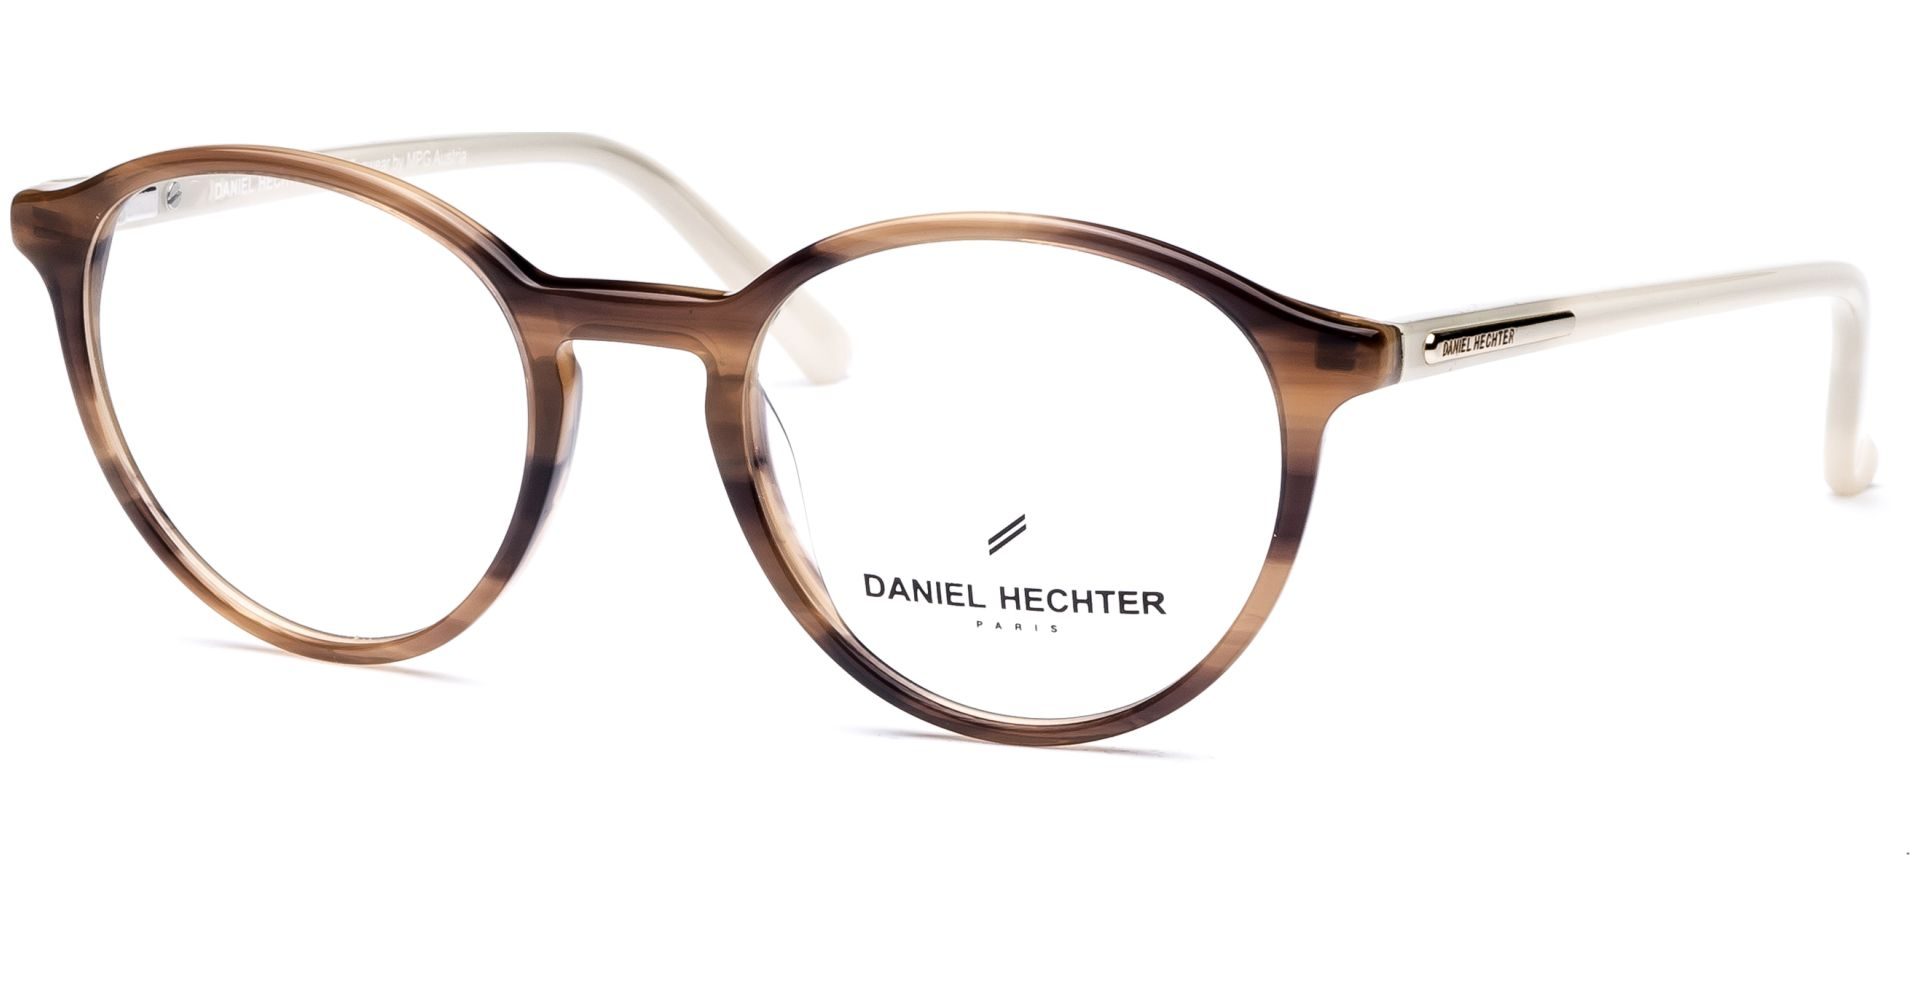 Daniel Hechter Dhp 554 5 4919 Light Brown Lensbest